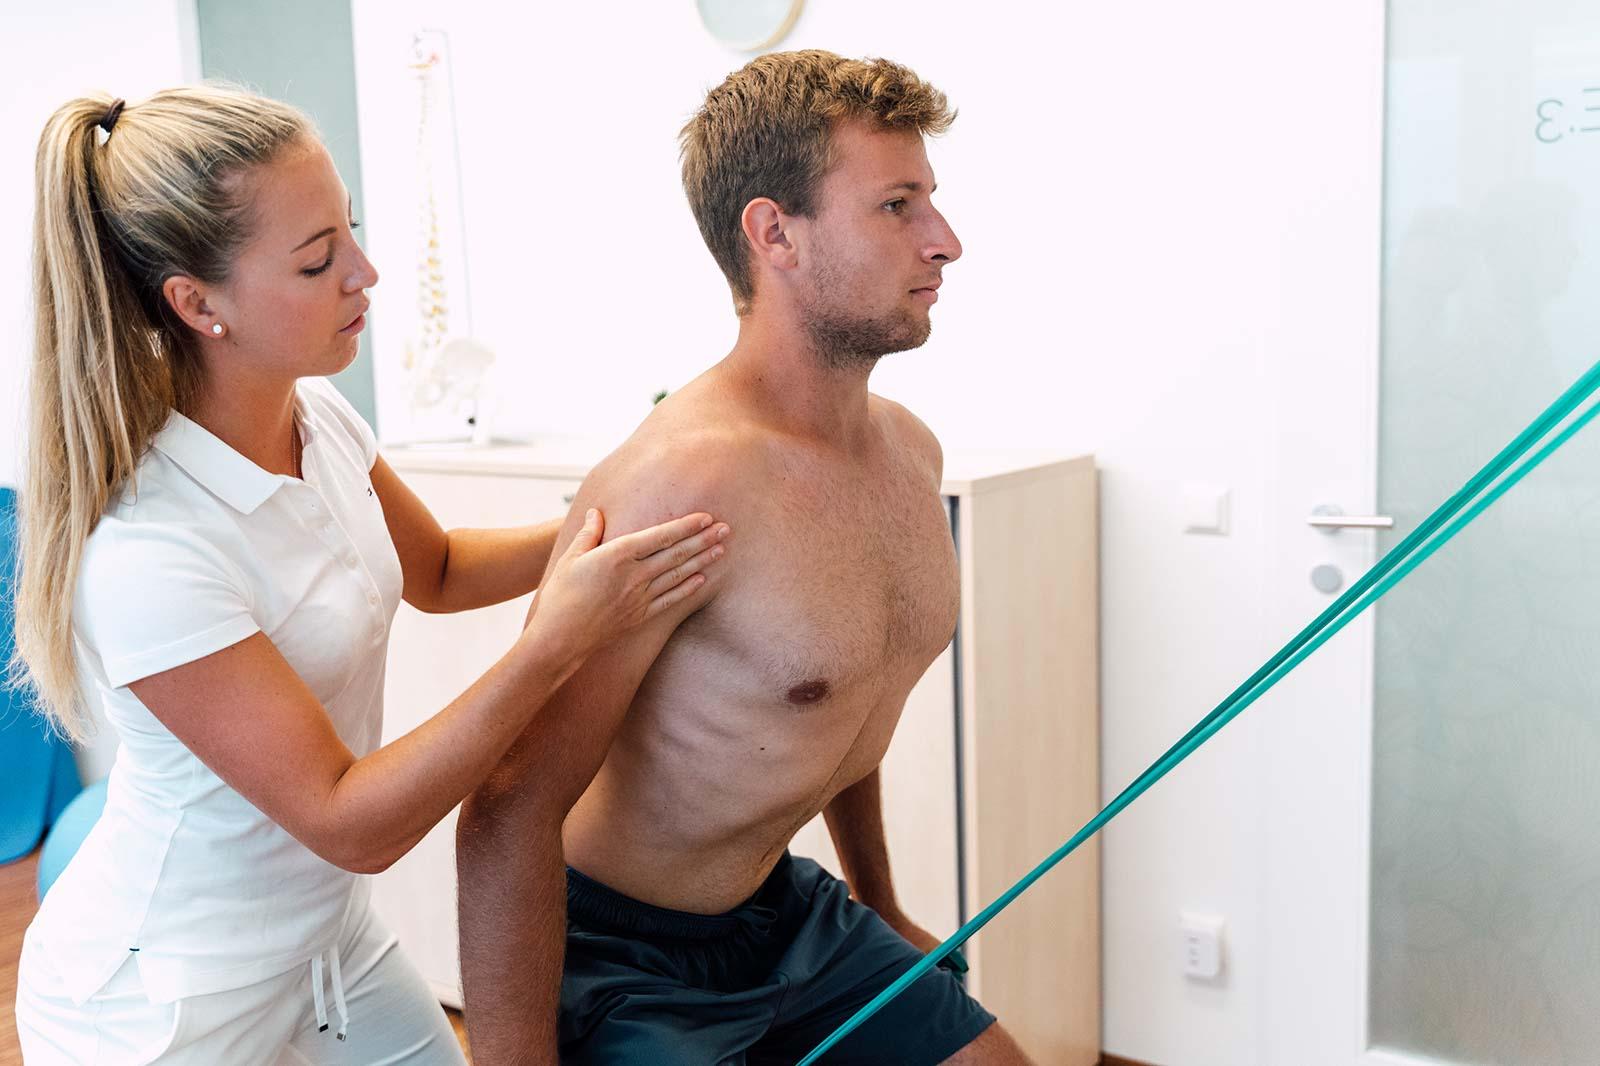 Livia Tasch, BSc., Prävention und Sport, Physiotherapeutin